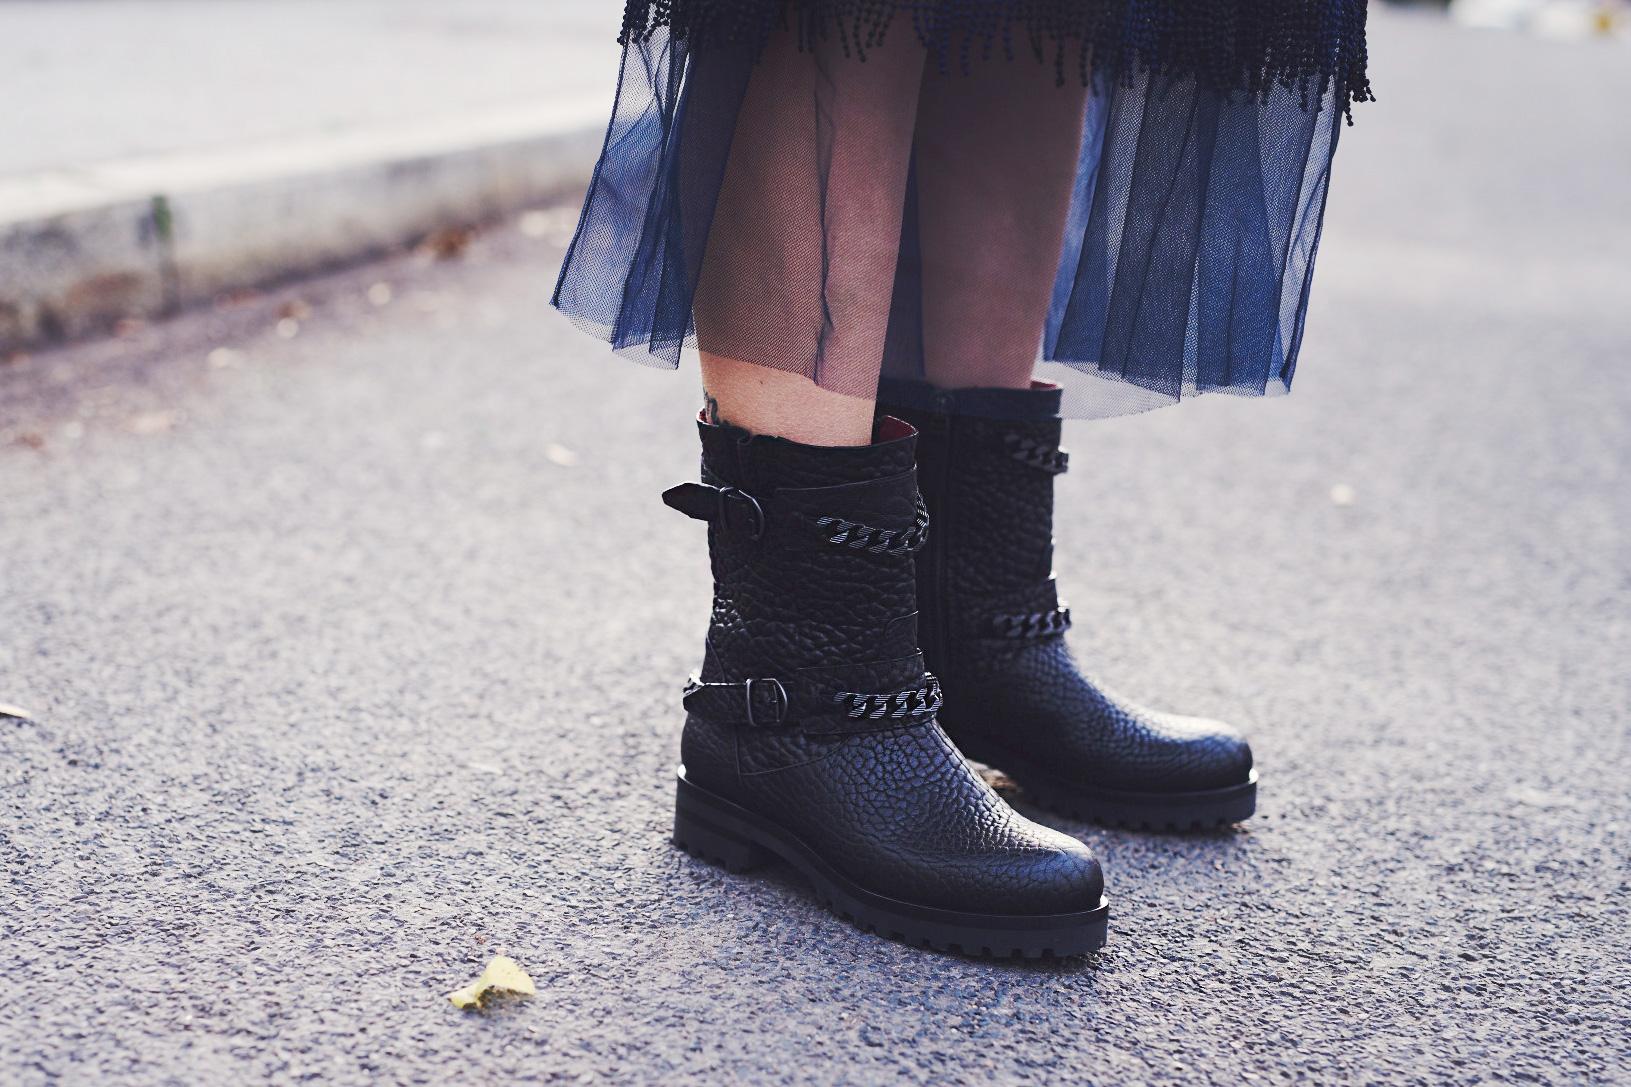 view more details on my blog   via Masha Sedgwick, fashion blogger from Berlin   wearing Pinko, Bally, Gestuz, Lili Radu